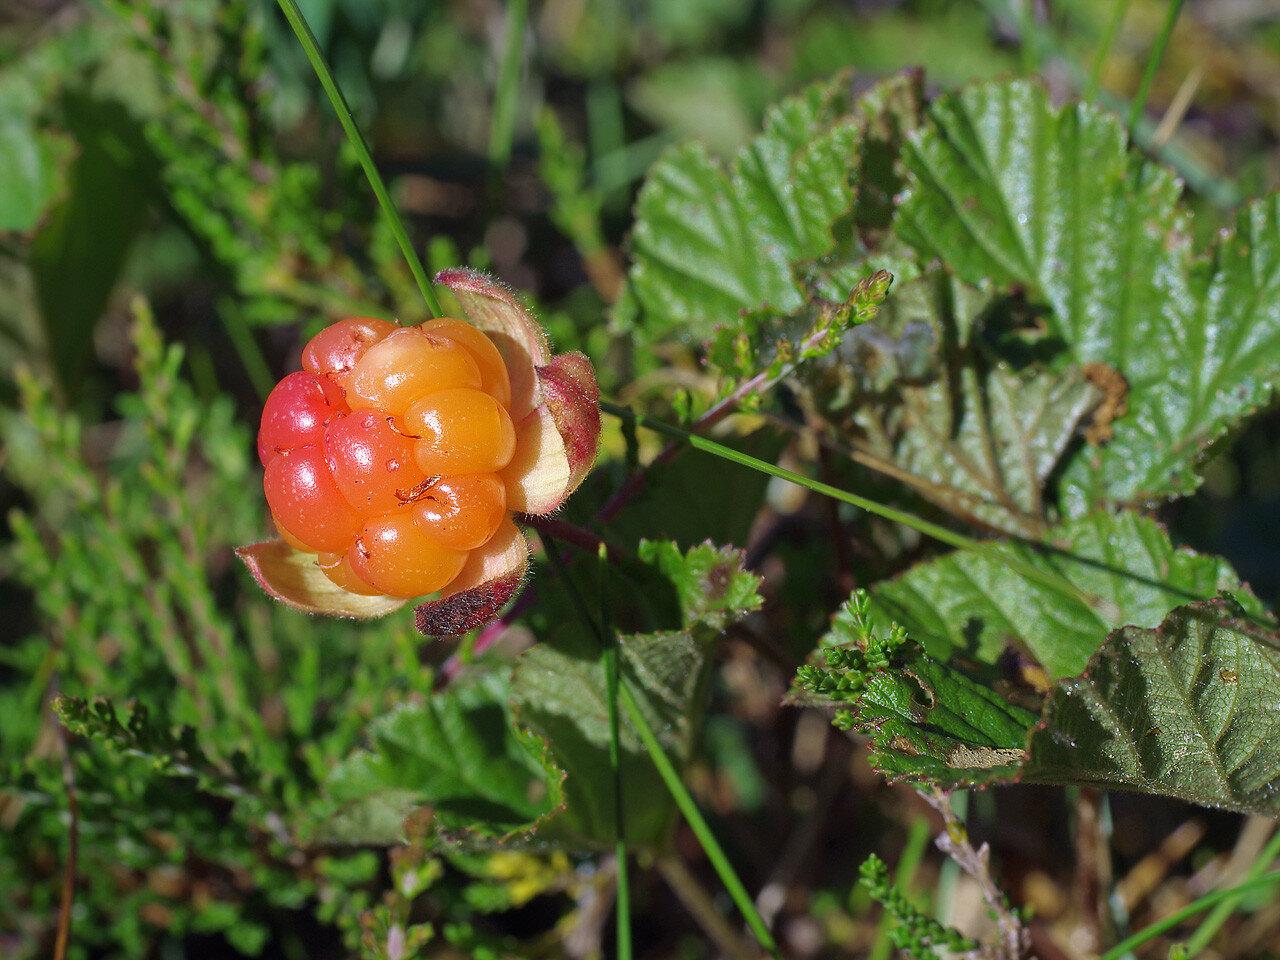 Морошка (Rubus chamaemorus). Автор фото: Юрий Семенов